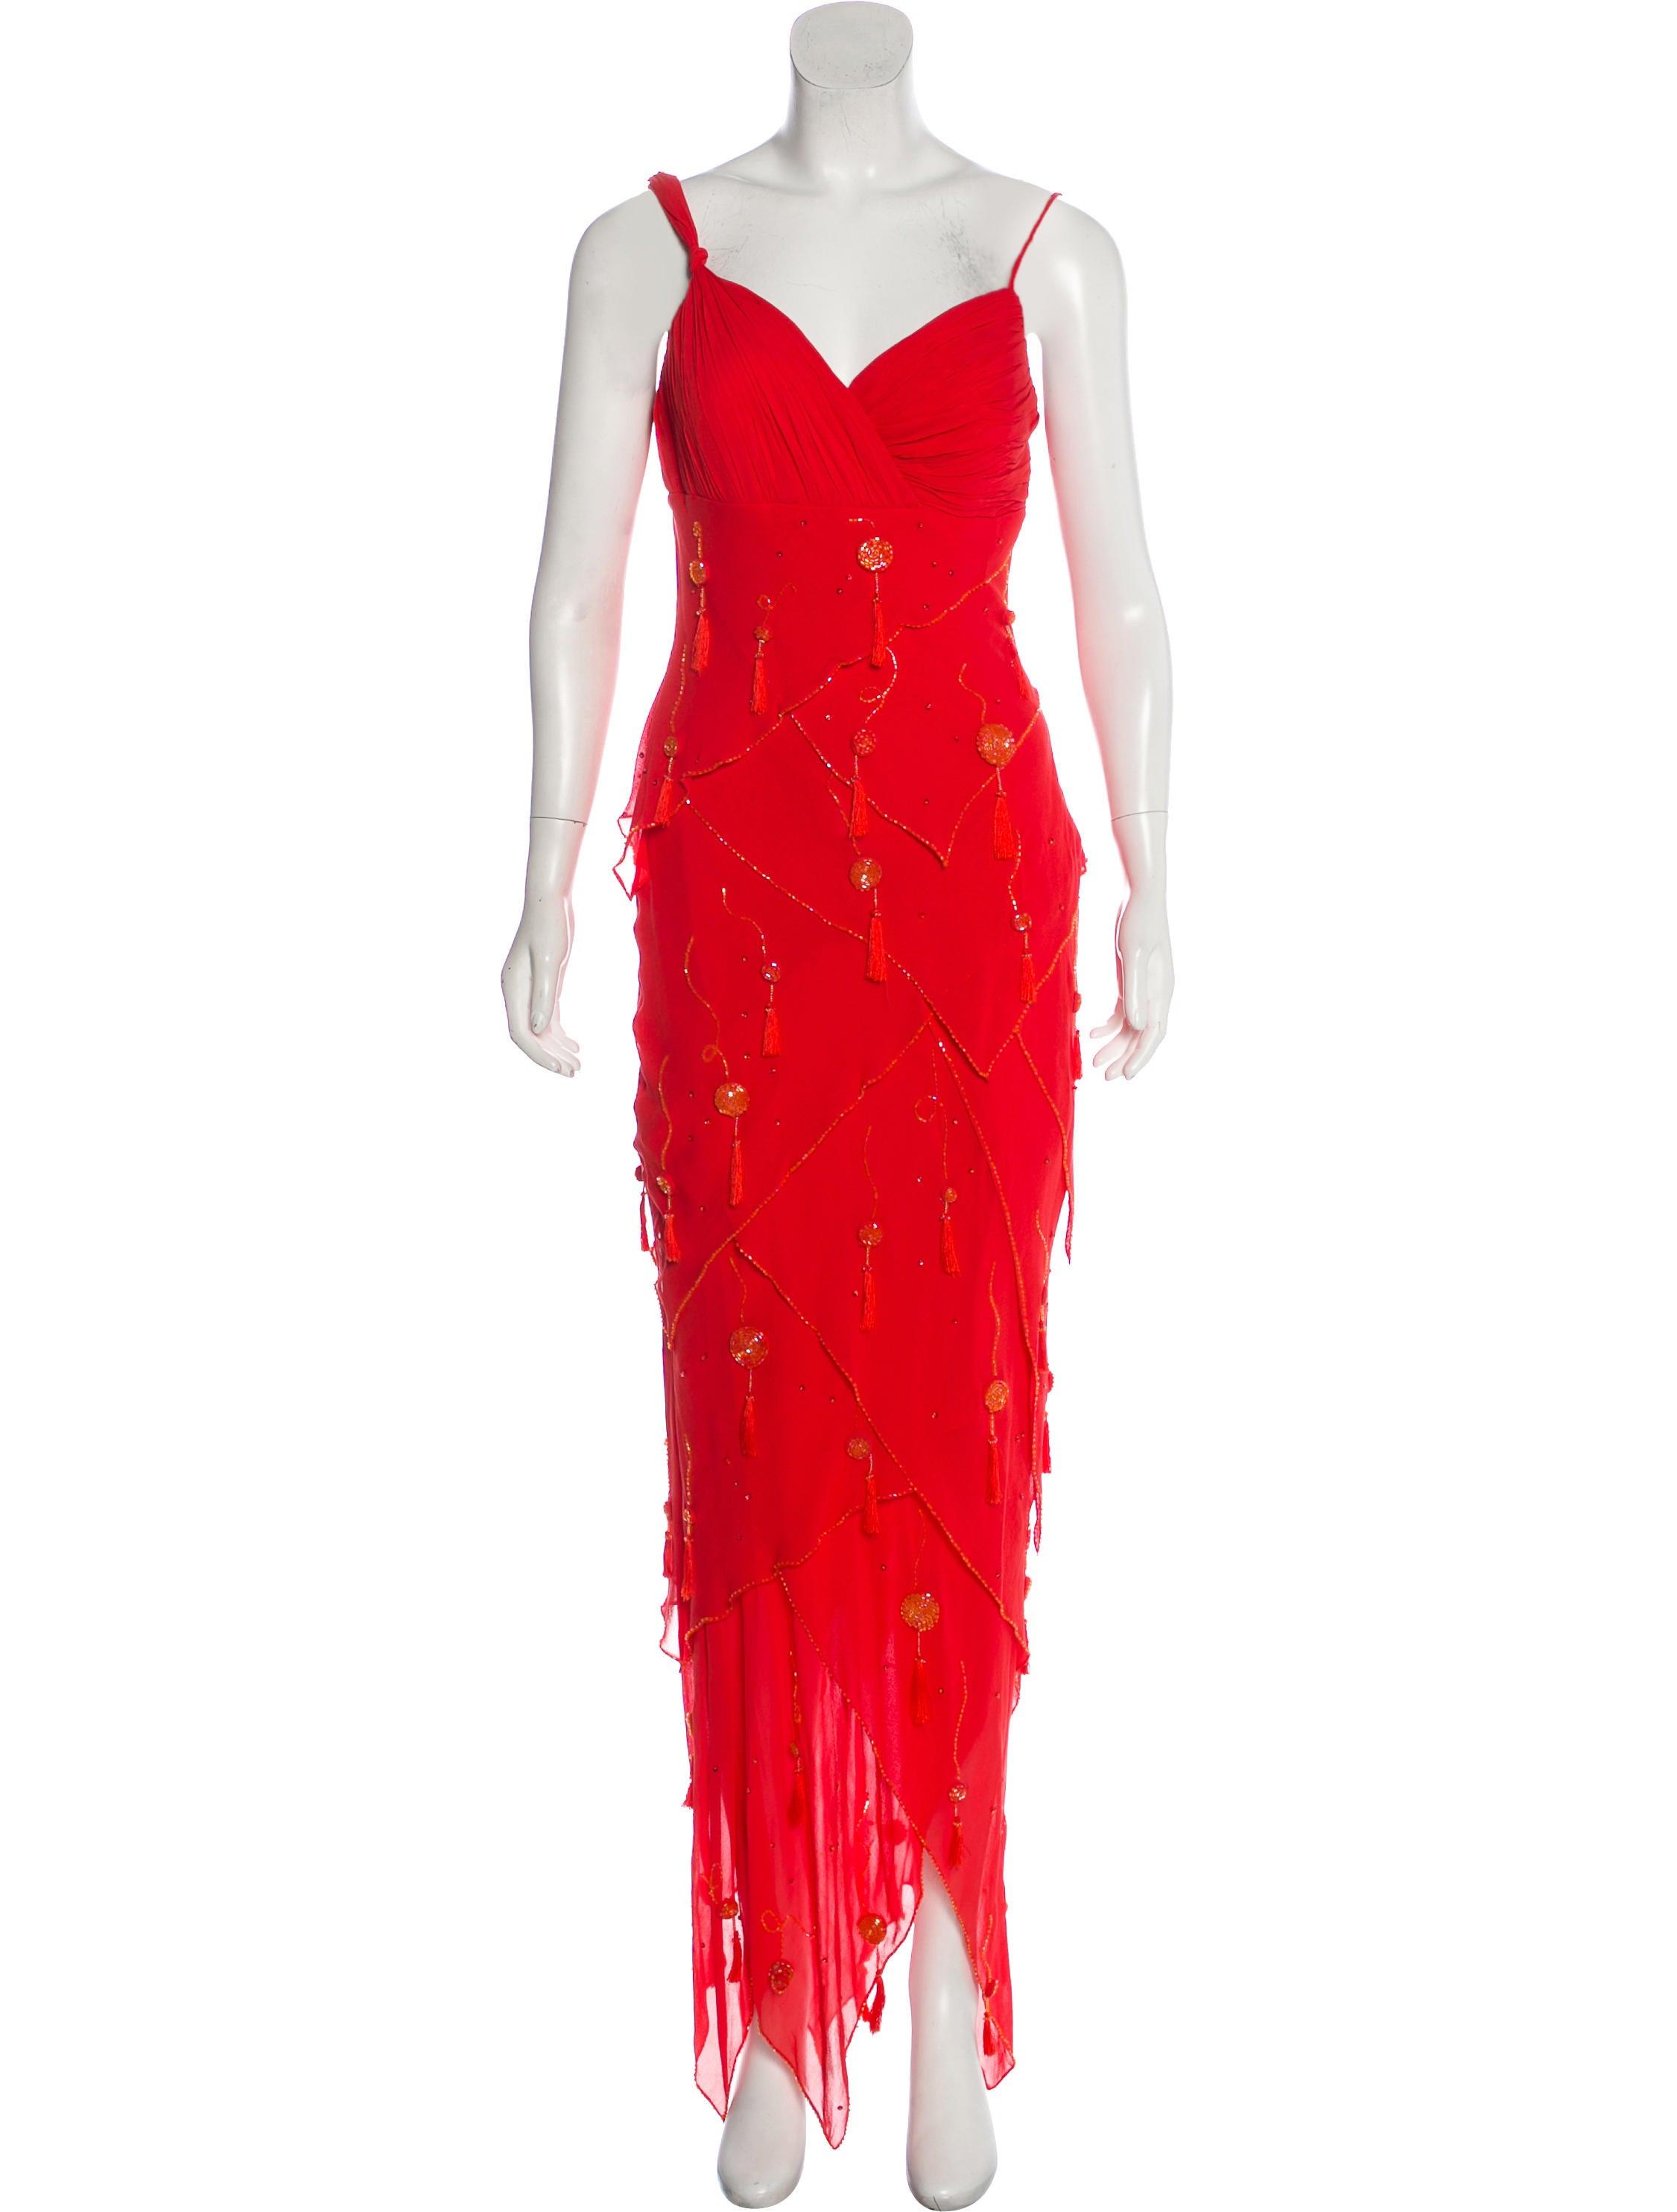 Sue Wong Silk Evening Dress - Clothing - WSQ20168   The RealReal